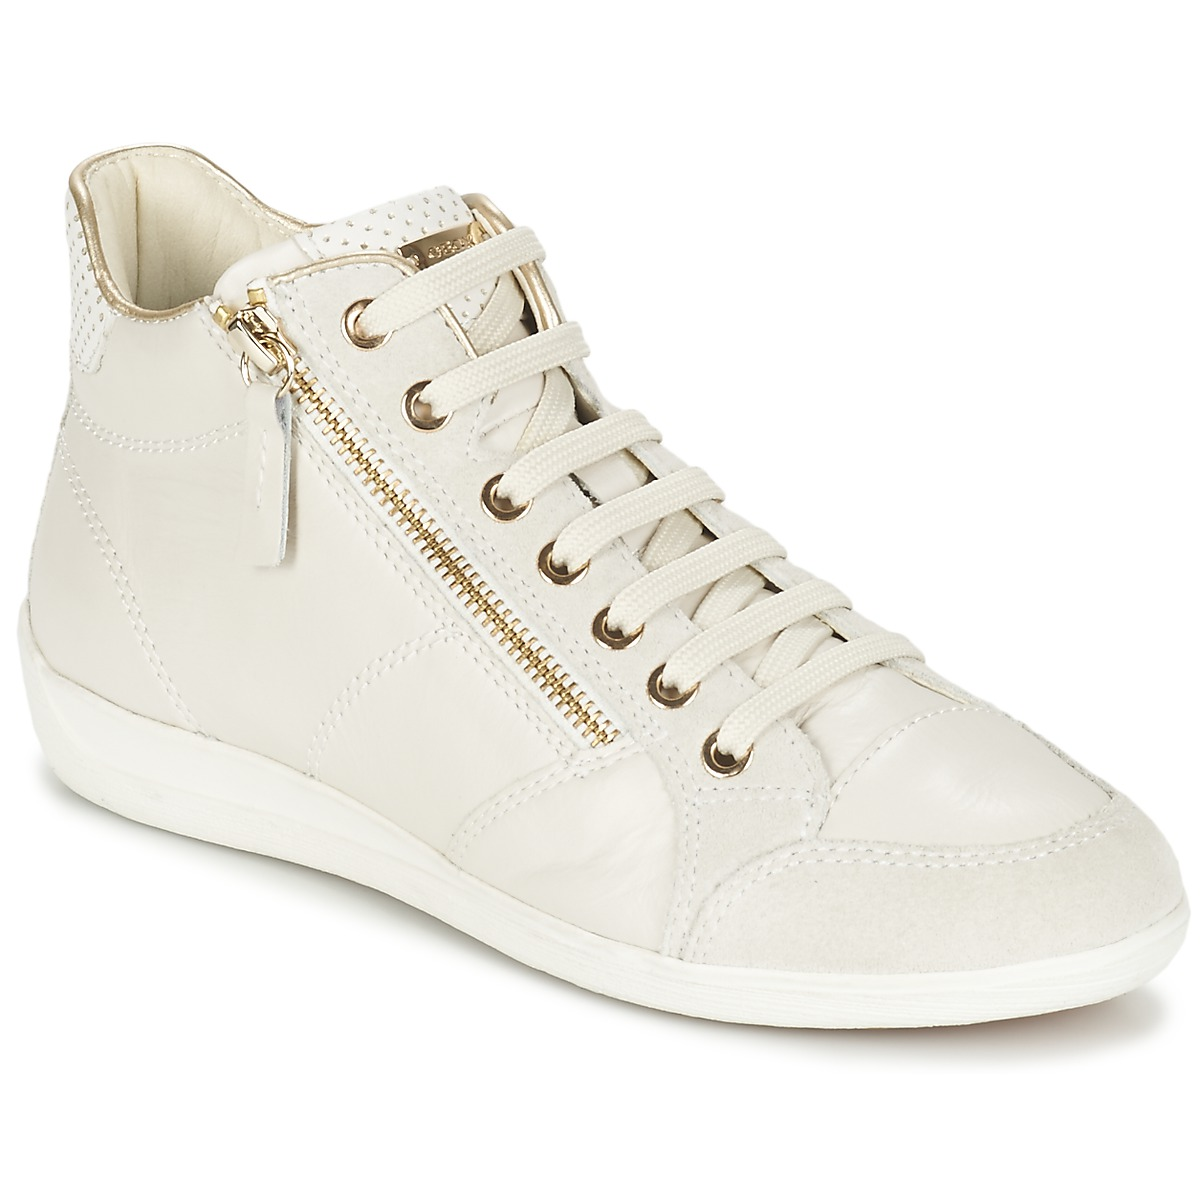 geox myria blanc chaussure pas cher avec chaussures basket montante femme 119 00. Black Bedroom Furniture Sets. Home Design Ideas